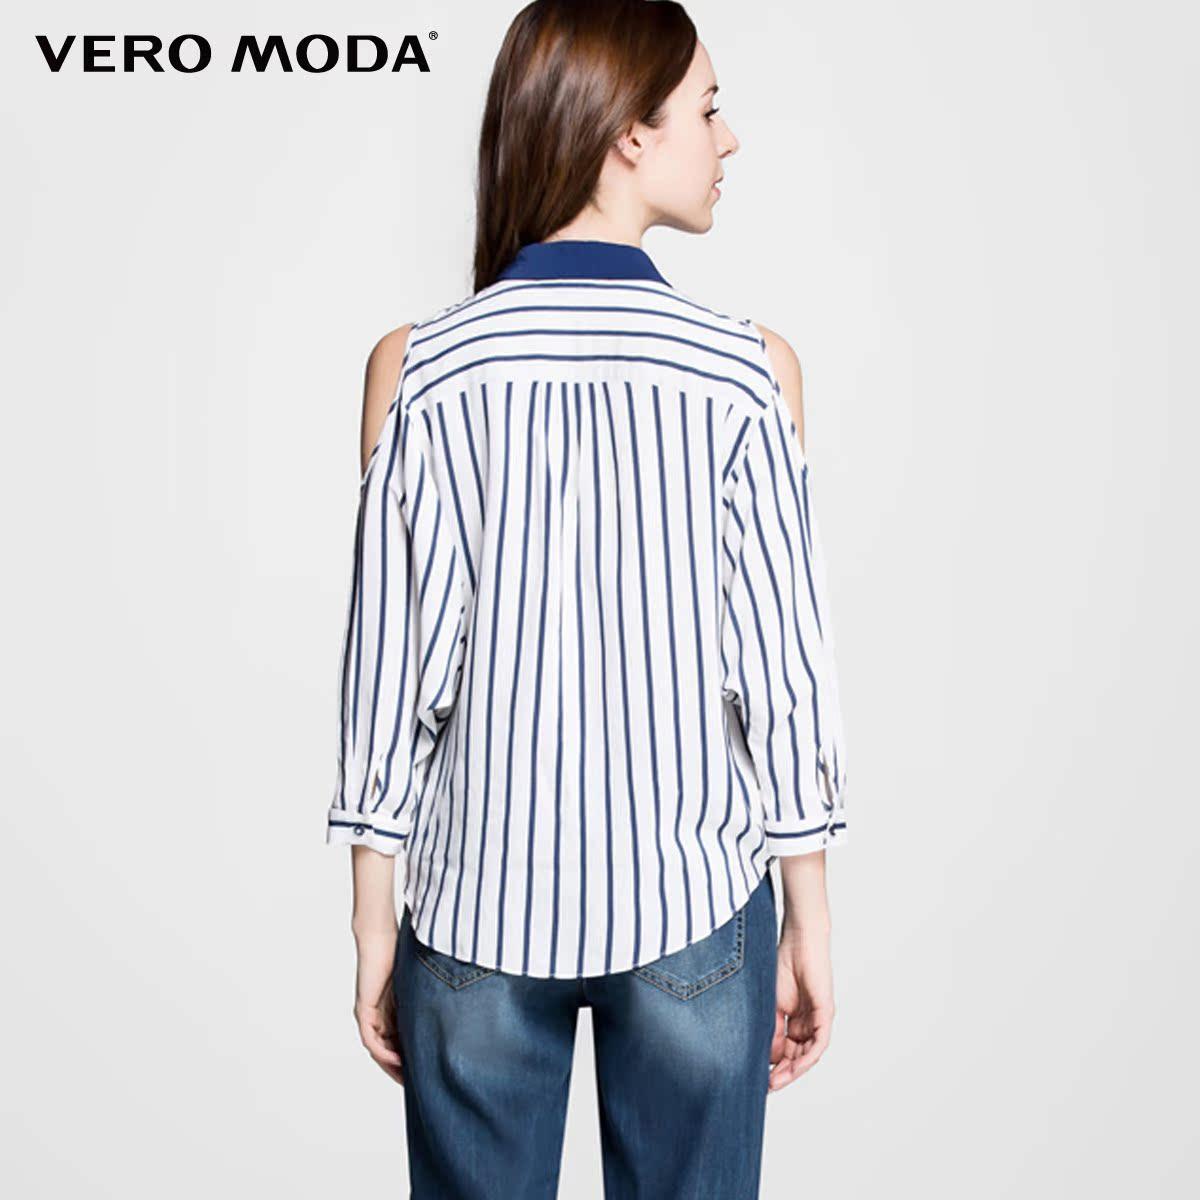 женская рубашка VERO MODA 314231017 VeroModa